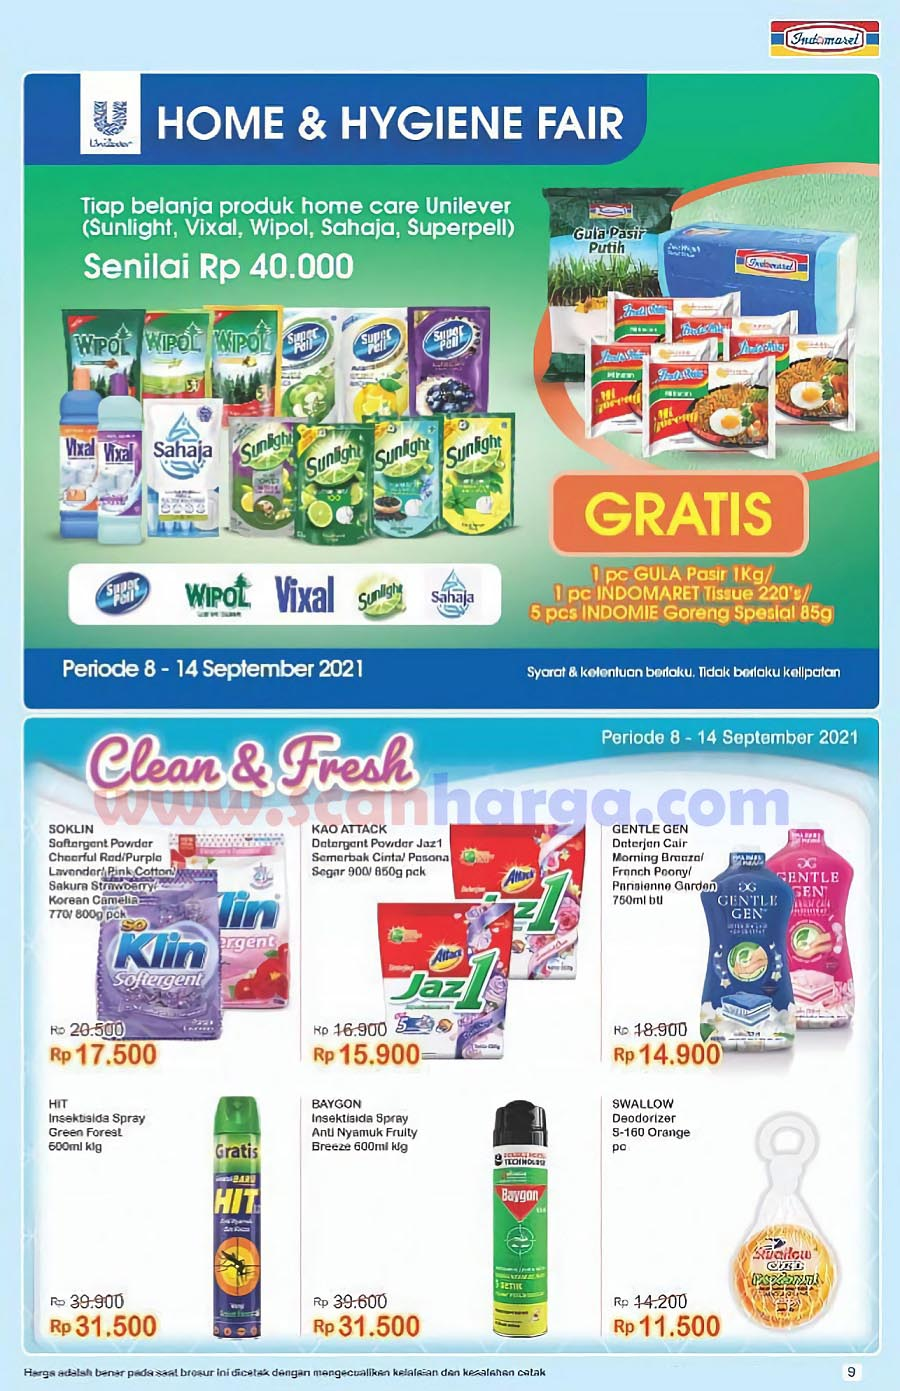 Katalog Indomaret Promo Terbaru 8 - 14 September 2021 9